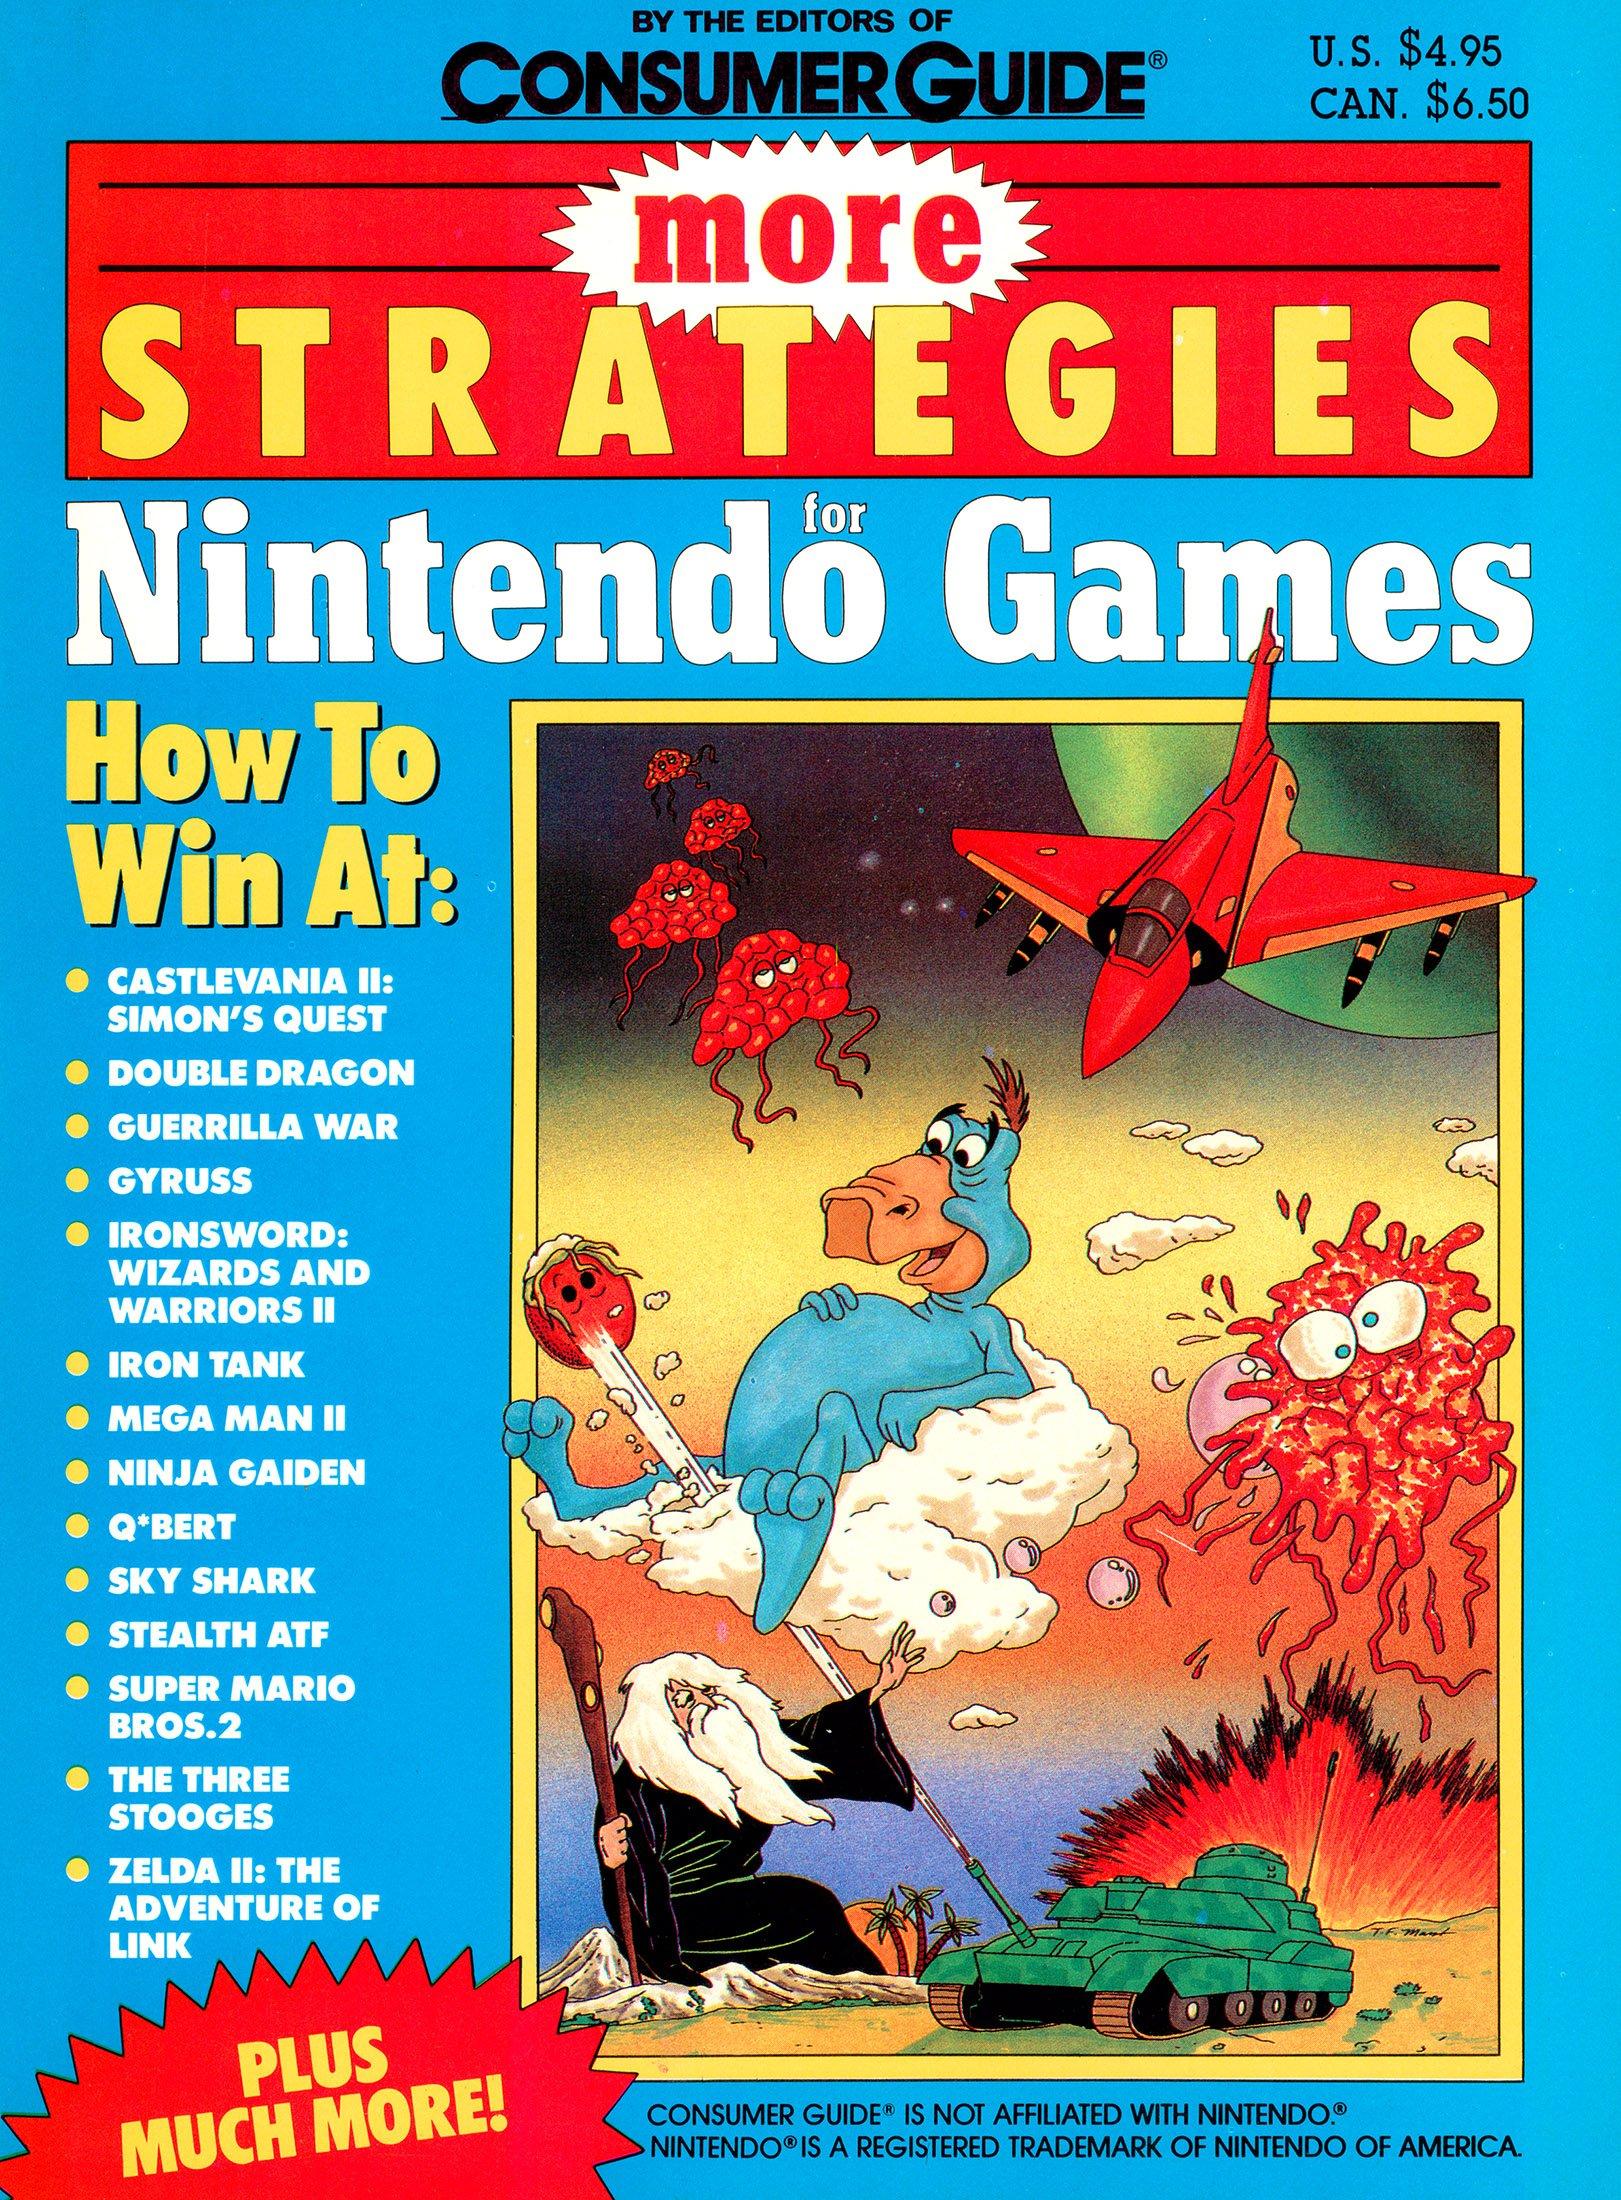 More Strategies for Nintendo Games